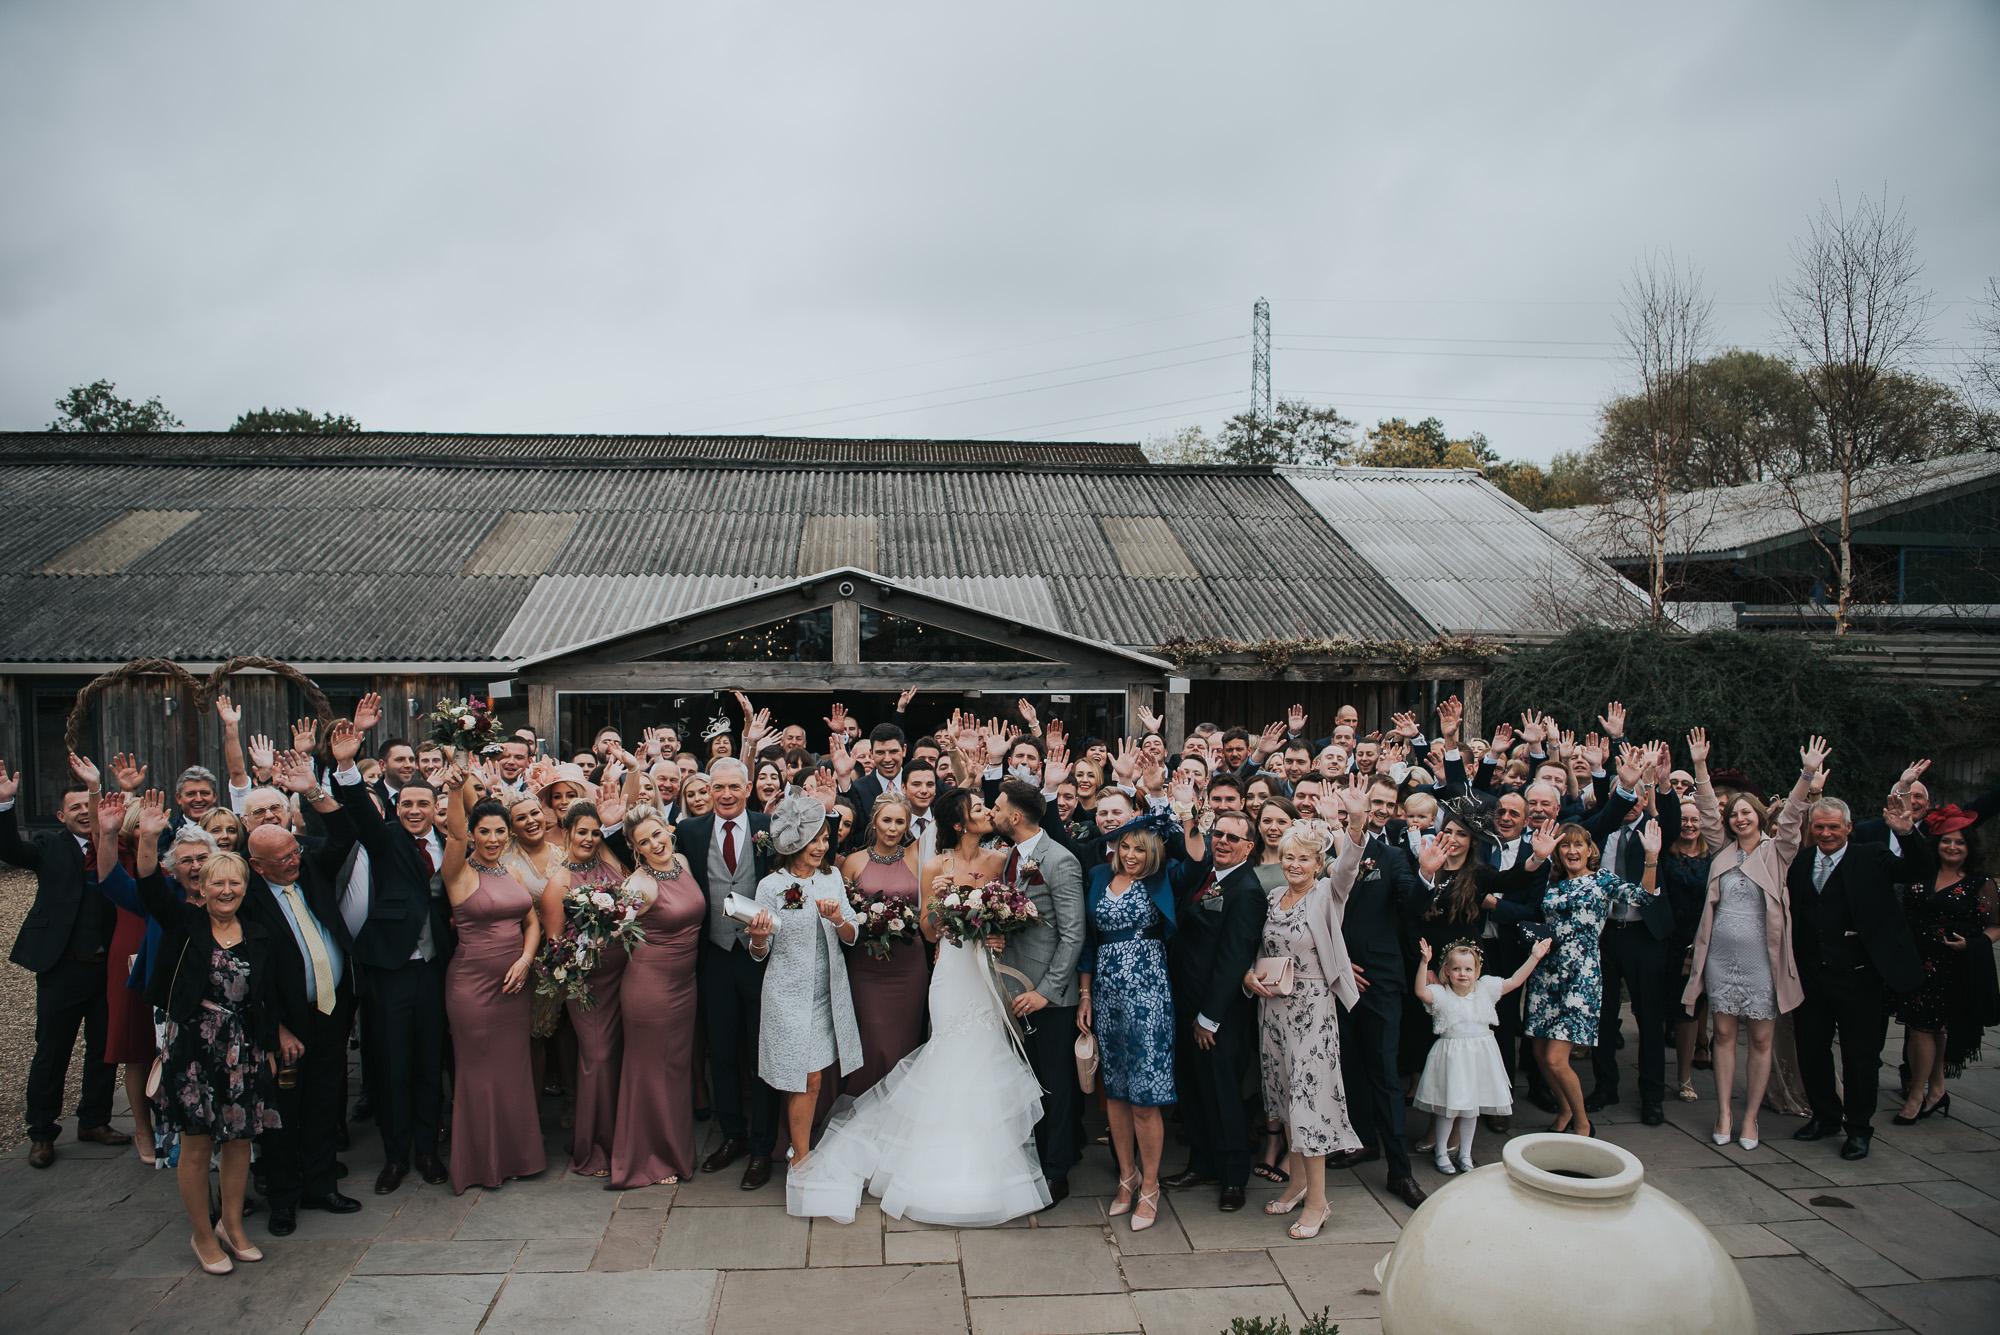 Owen house wedding barn wedding photographer north west cheshire england (27 of 38).jpg